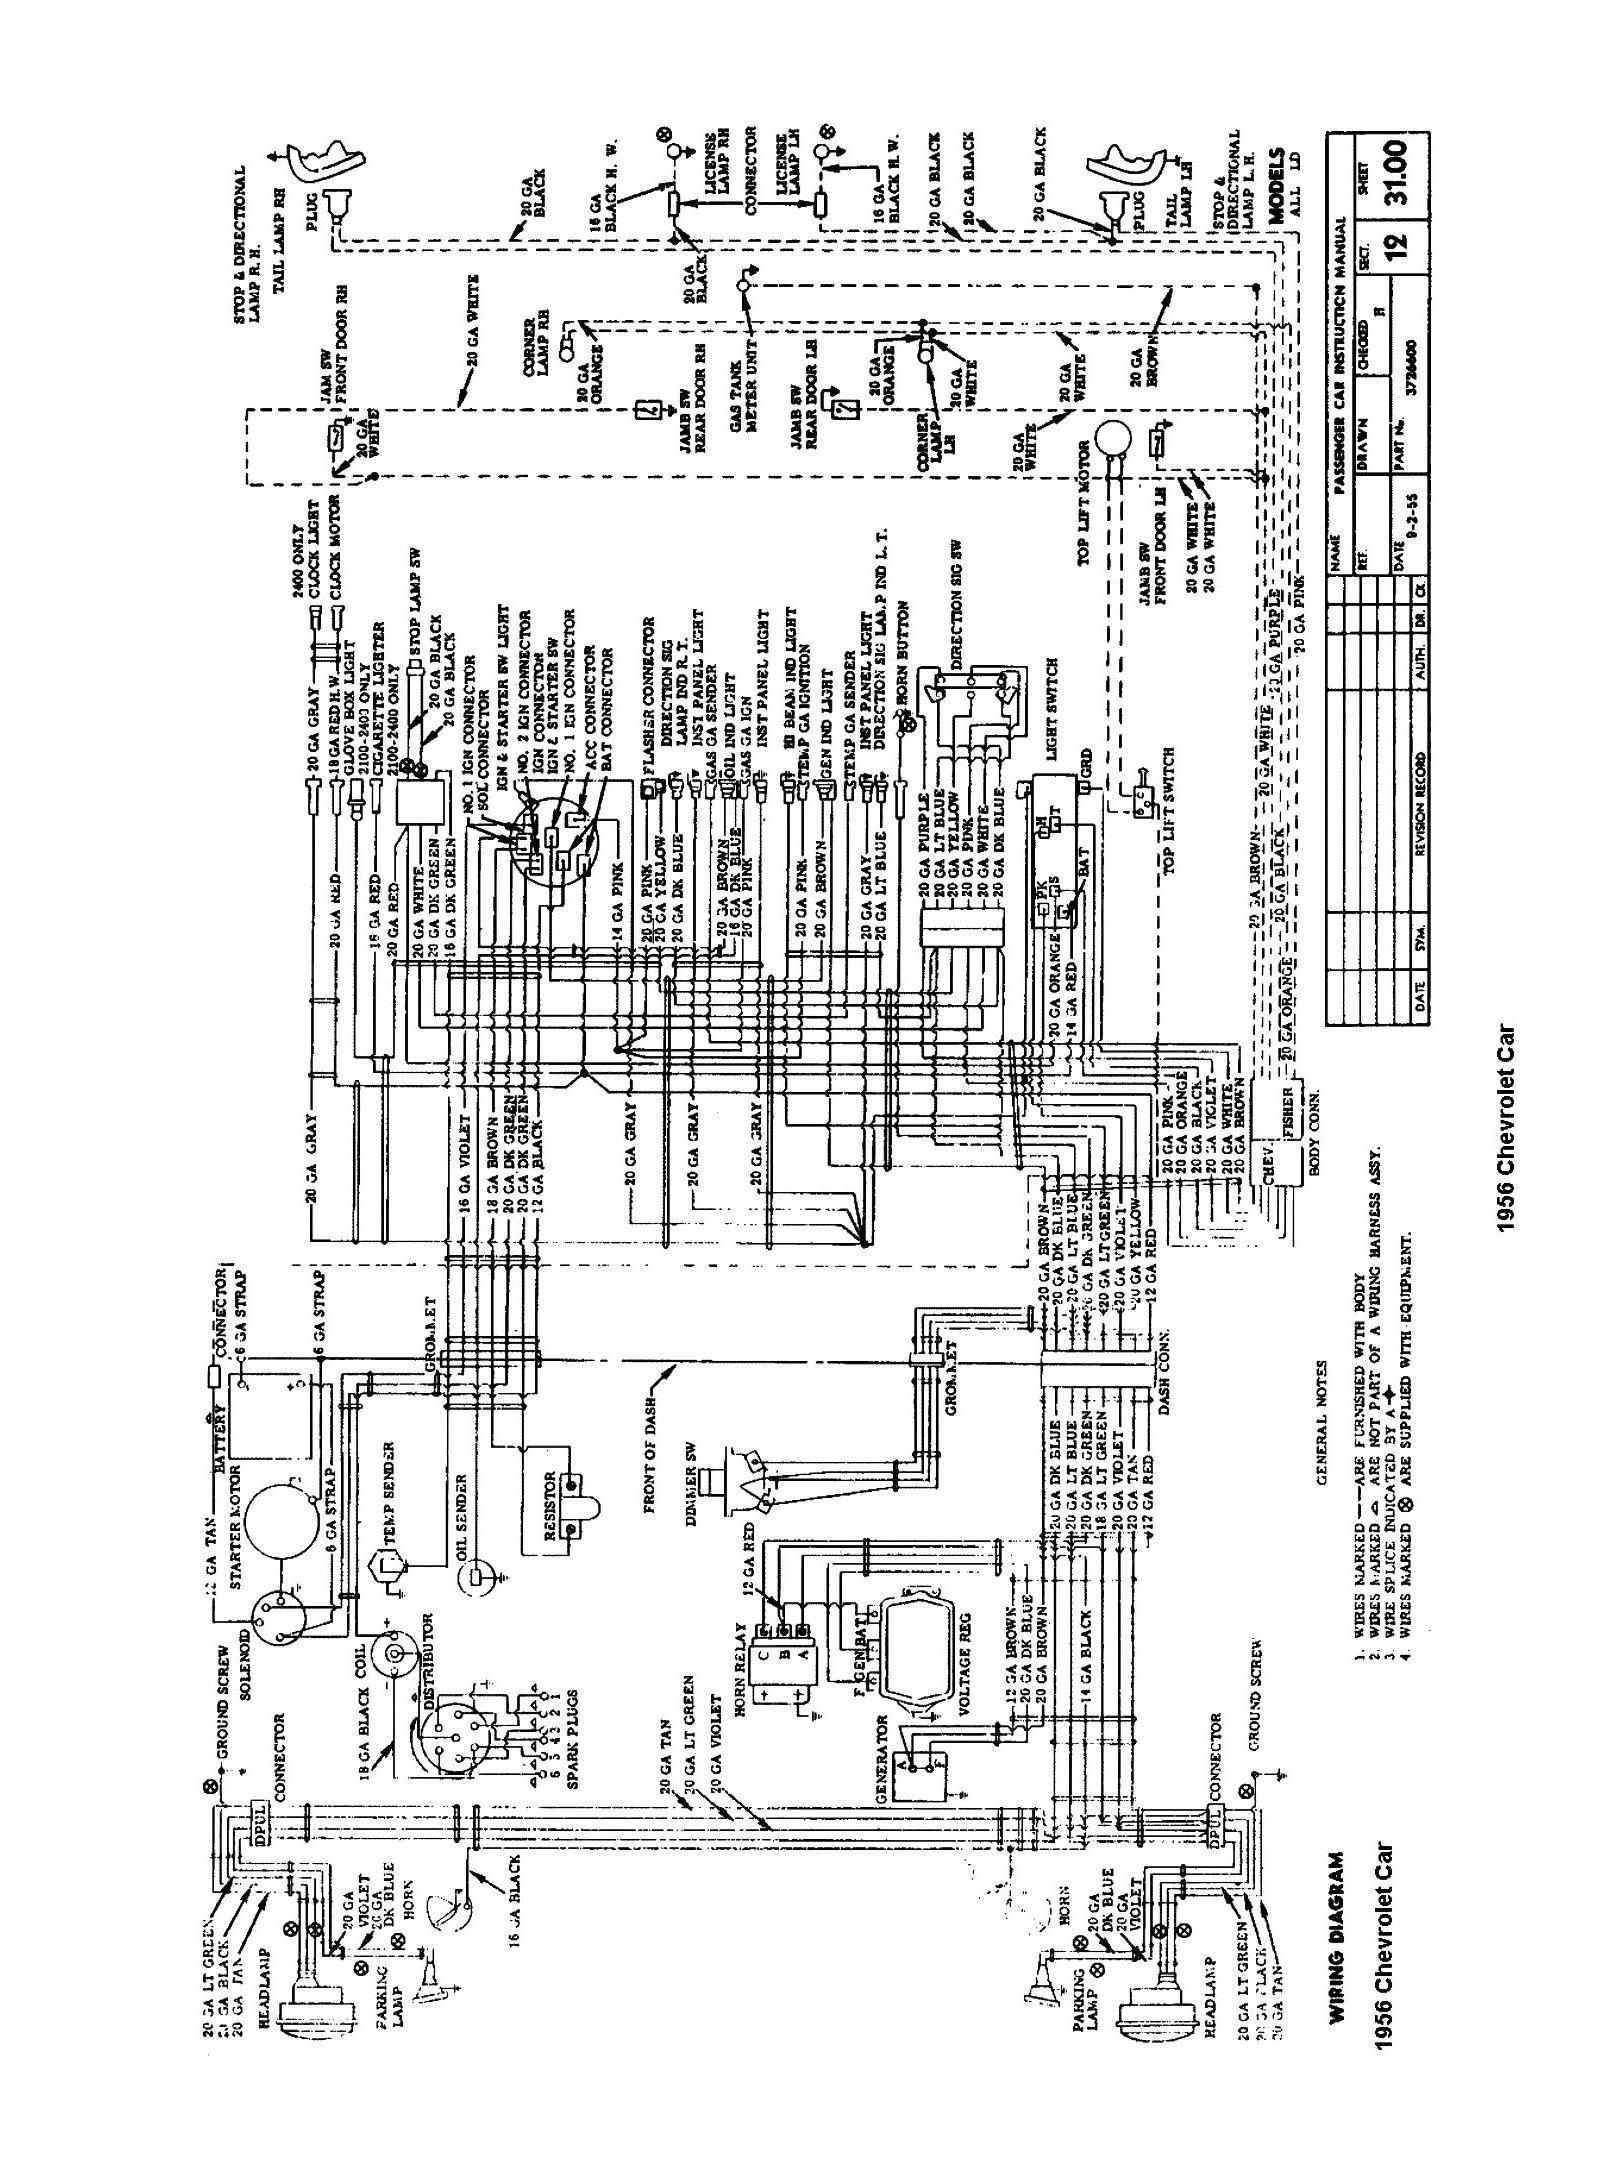 hight resolution of international truck wiring diagram manual download 1956 passenger car wiring 13 h download wiring diagram